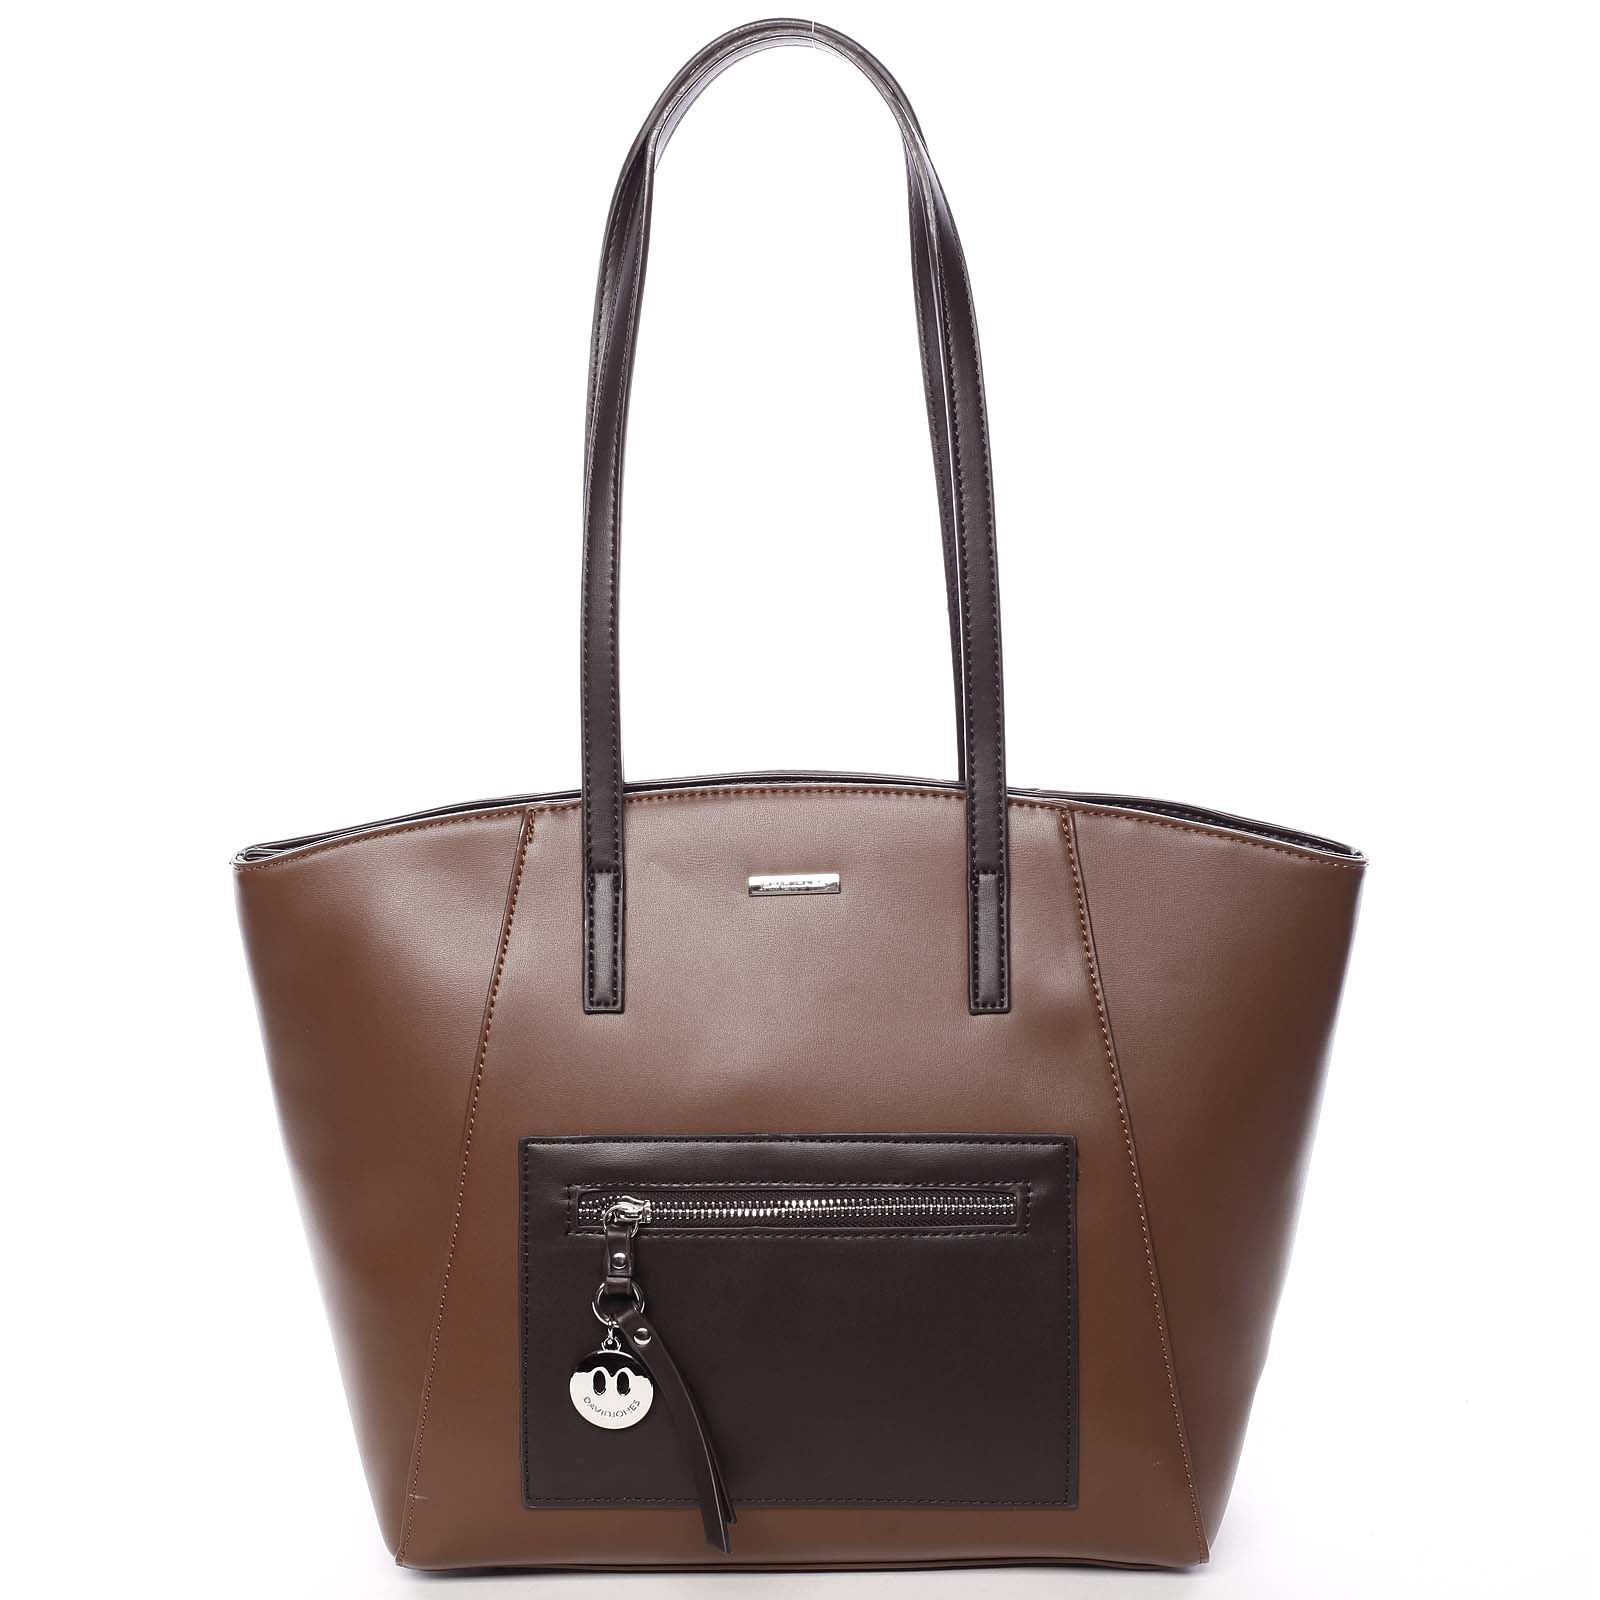 Moderná dámska kabelka cez plece hnedá - David Jones Adria hnedá